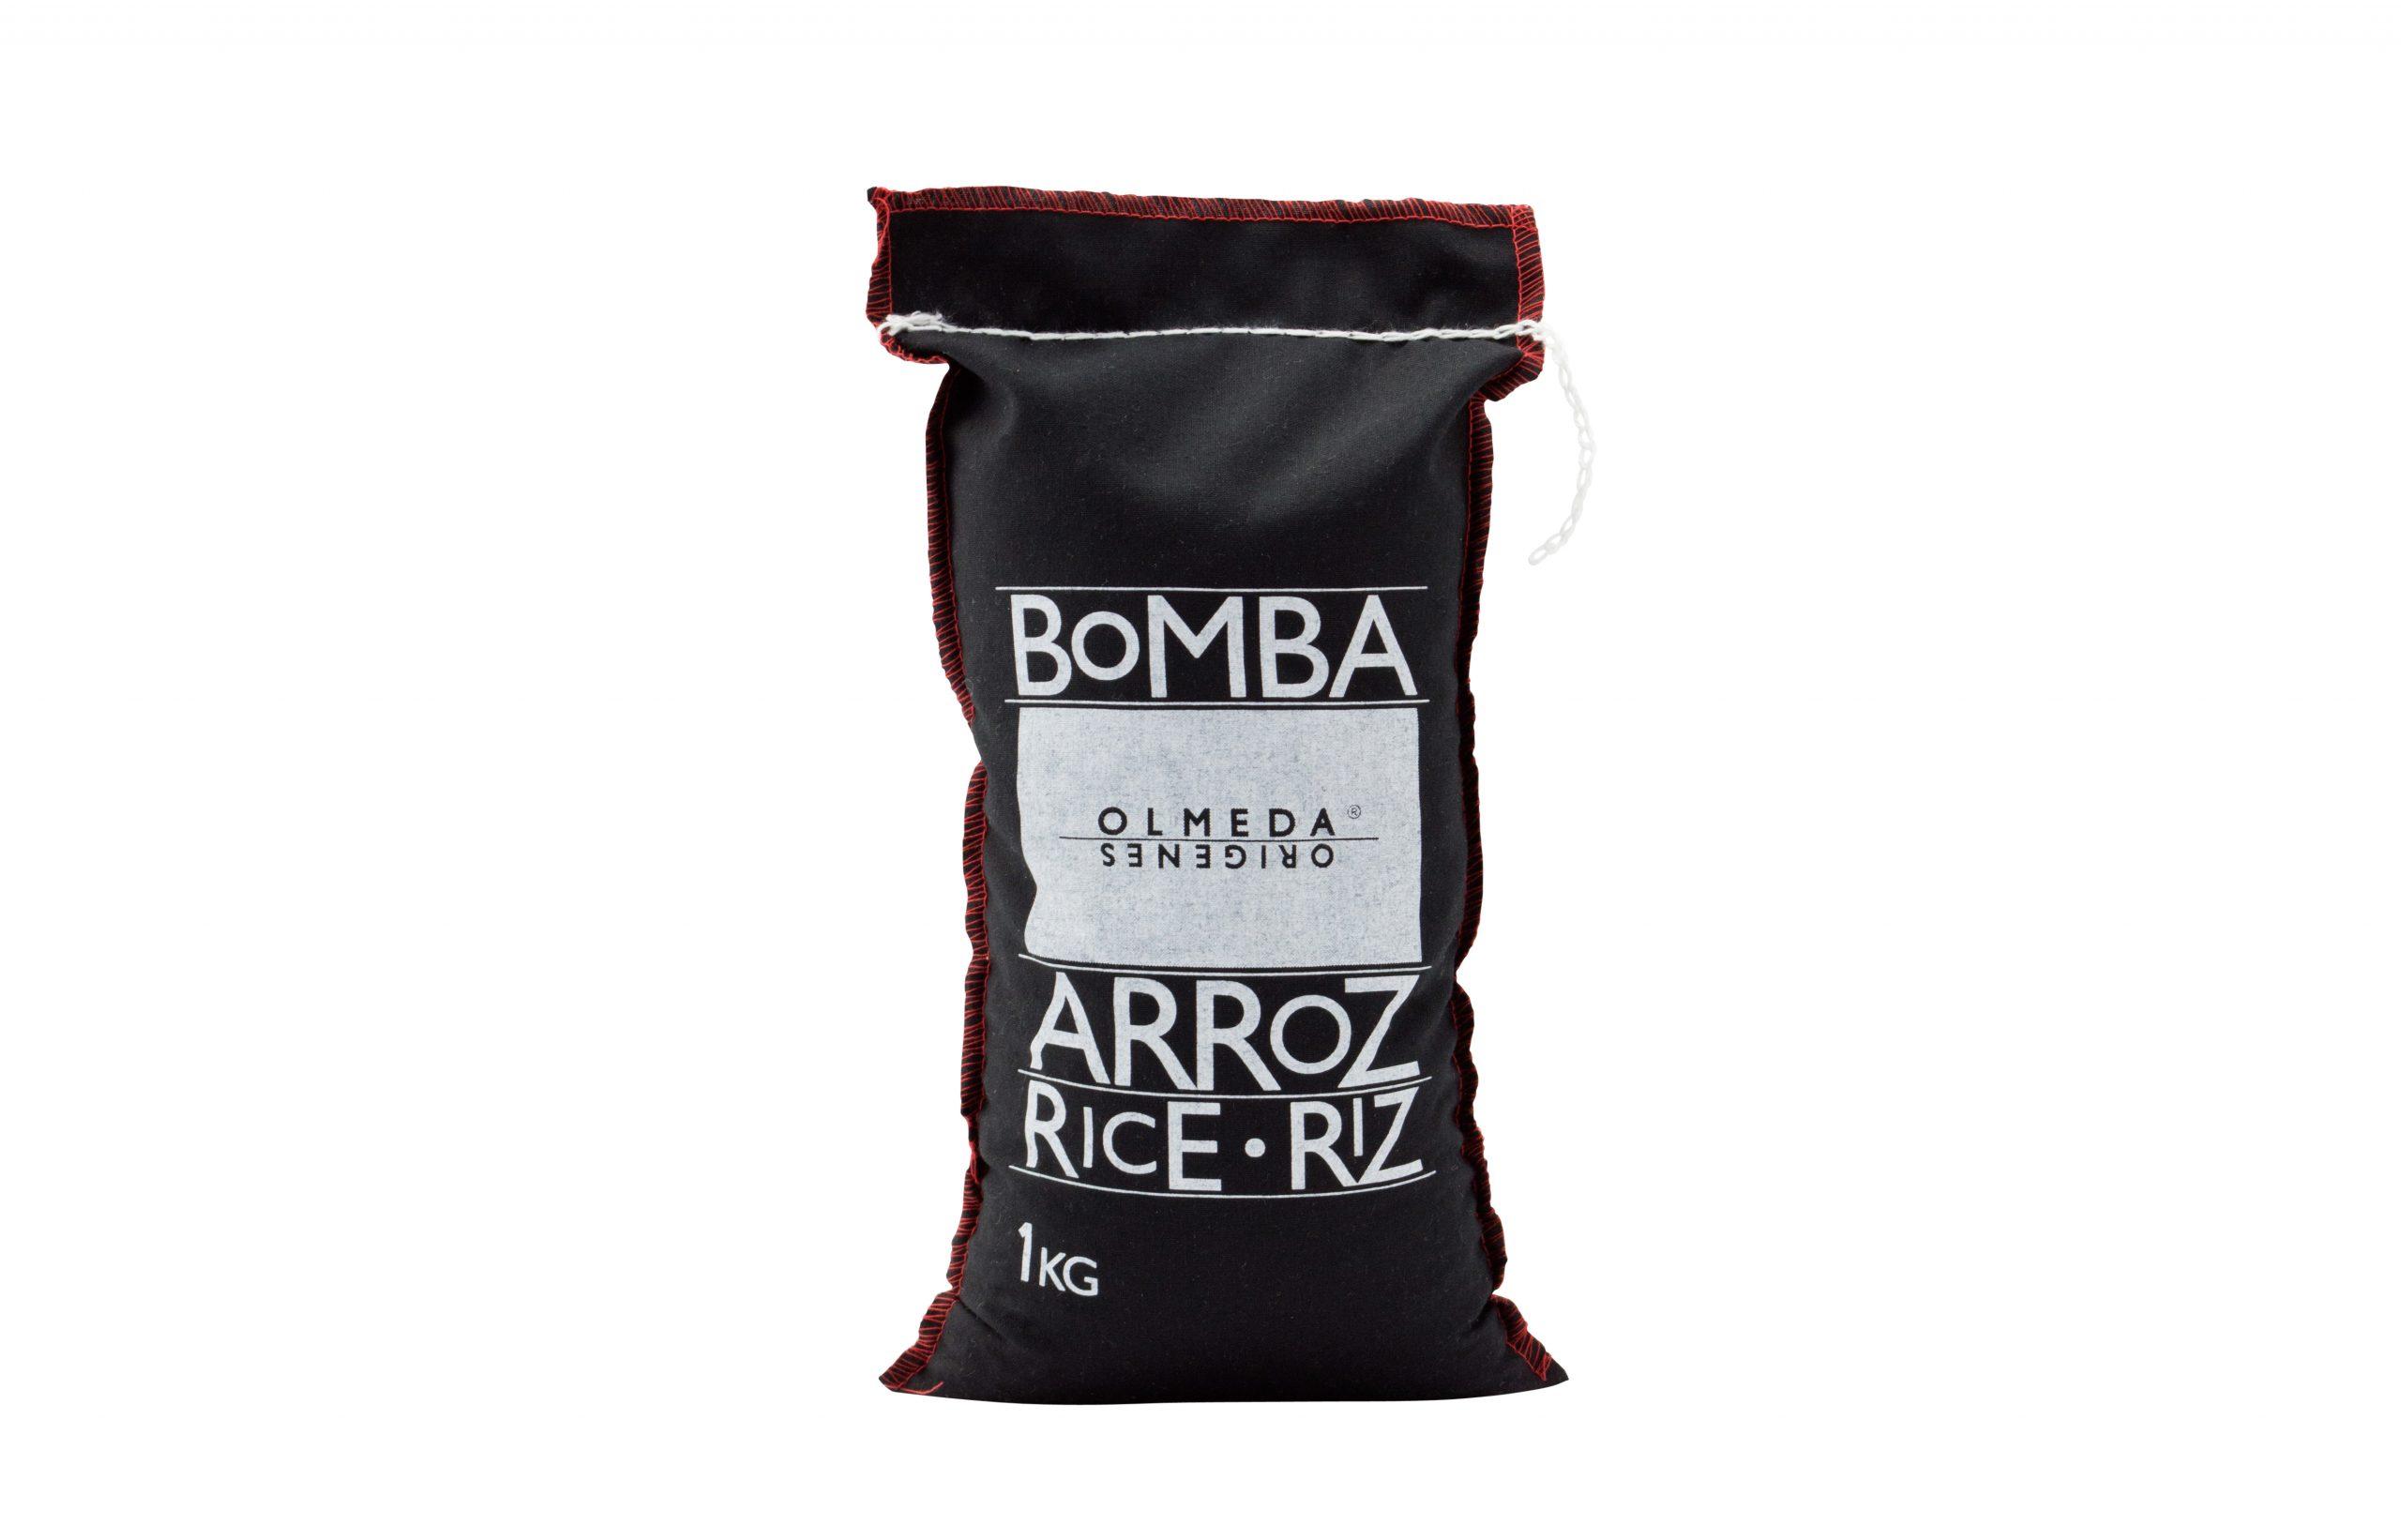 26001_ARROZ BOMBA_BOMBA RICE_OLMEDA_ORIGENES_1KG_HD